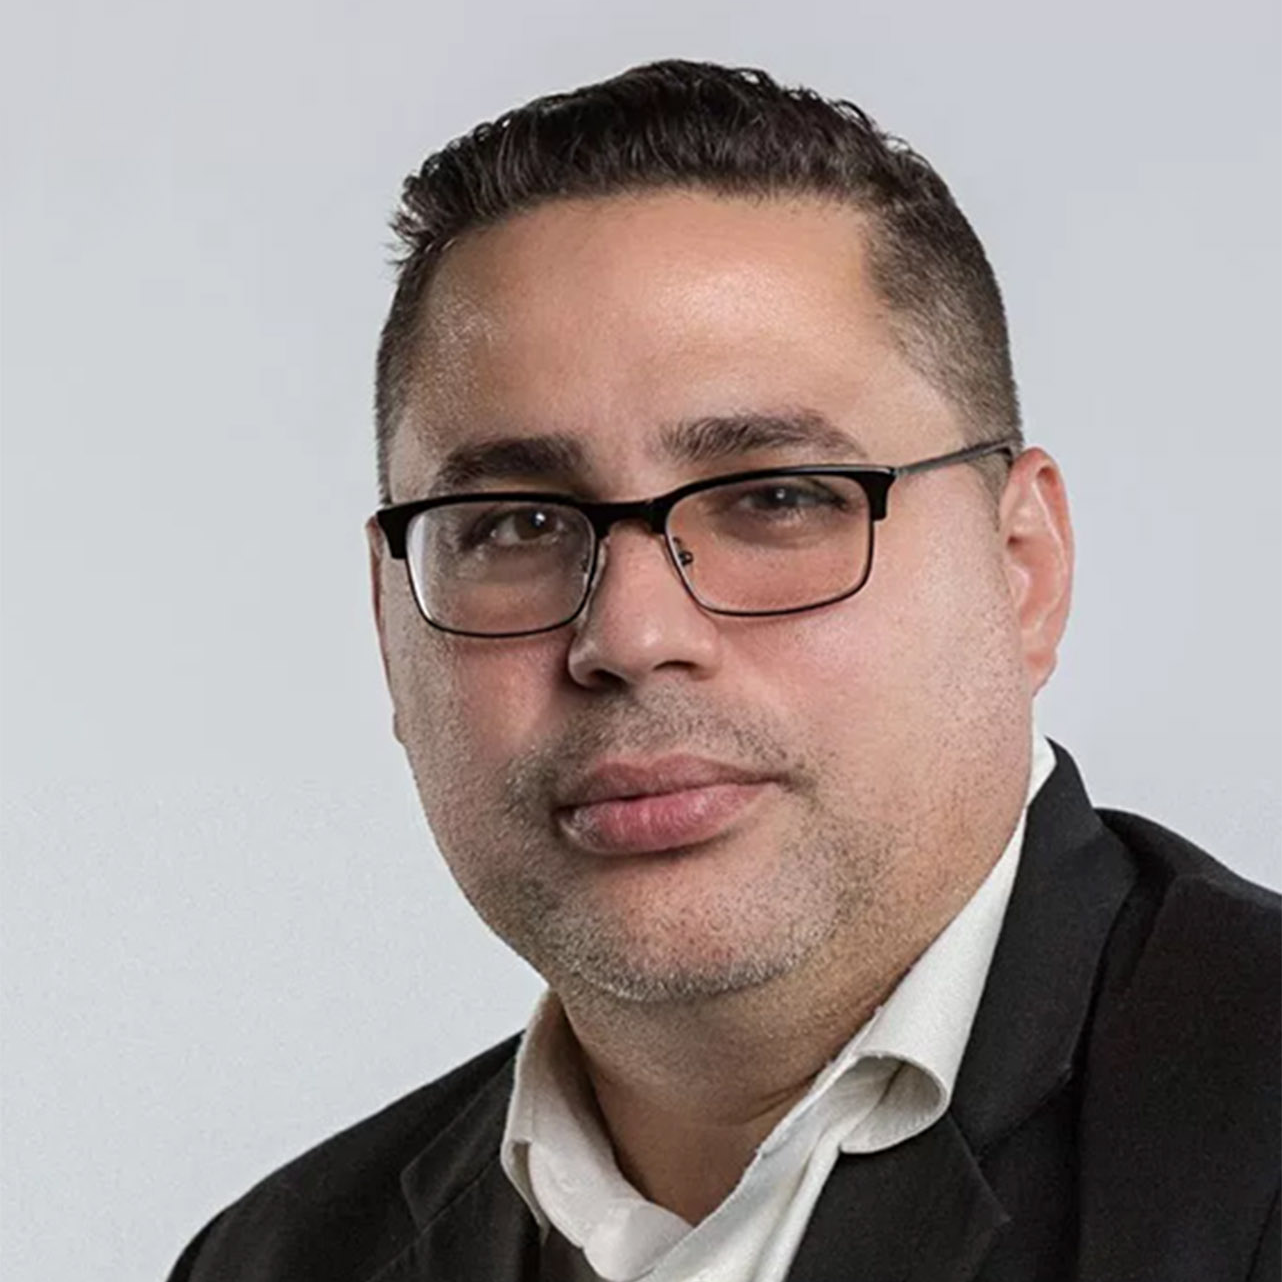 GABRIEL SALGUERO  President, National Latino Evangelical Coalition